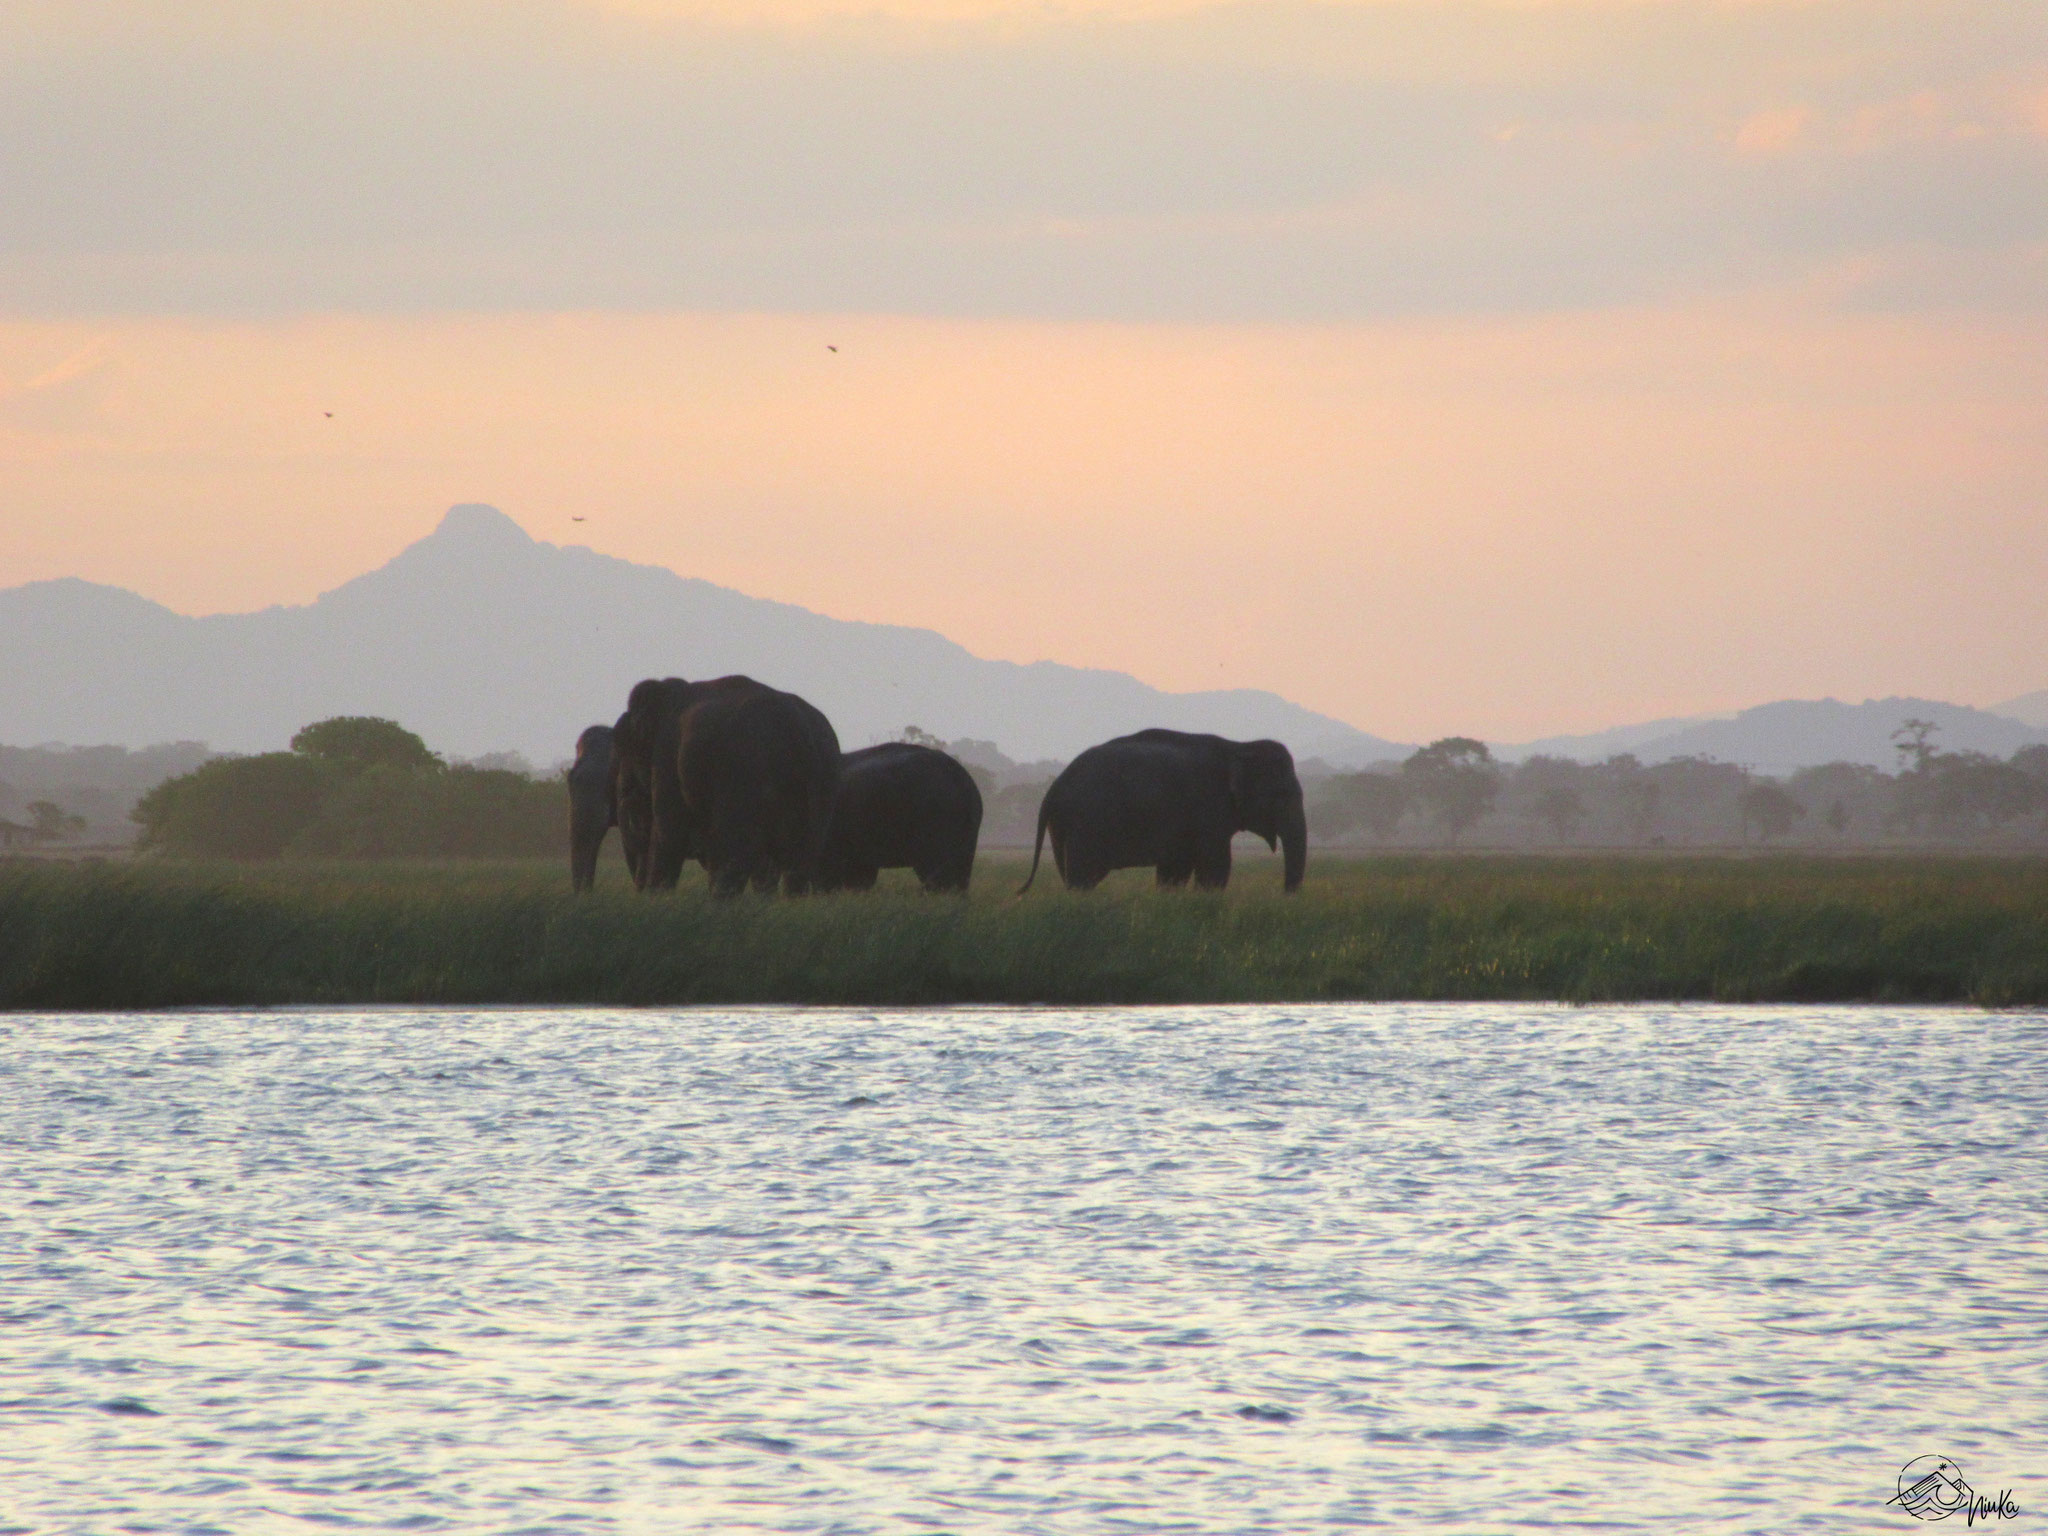 Elephants at the lagoon